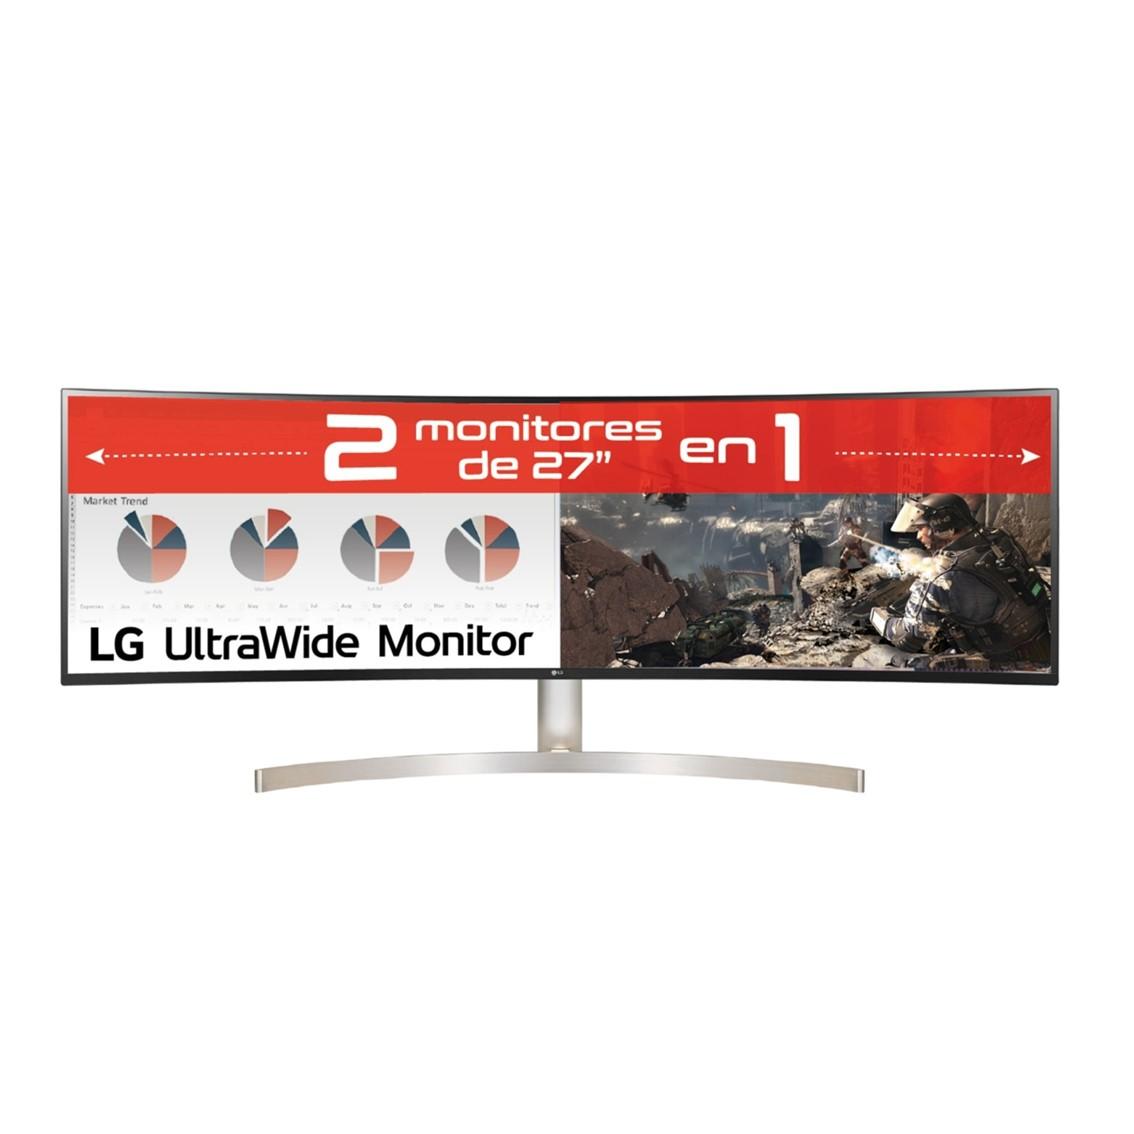 Monitor led lg ips curvo 49wl95c - we 5120 x 1440 5ms hdmi display port usb - c reg. altura